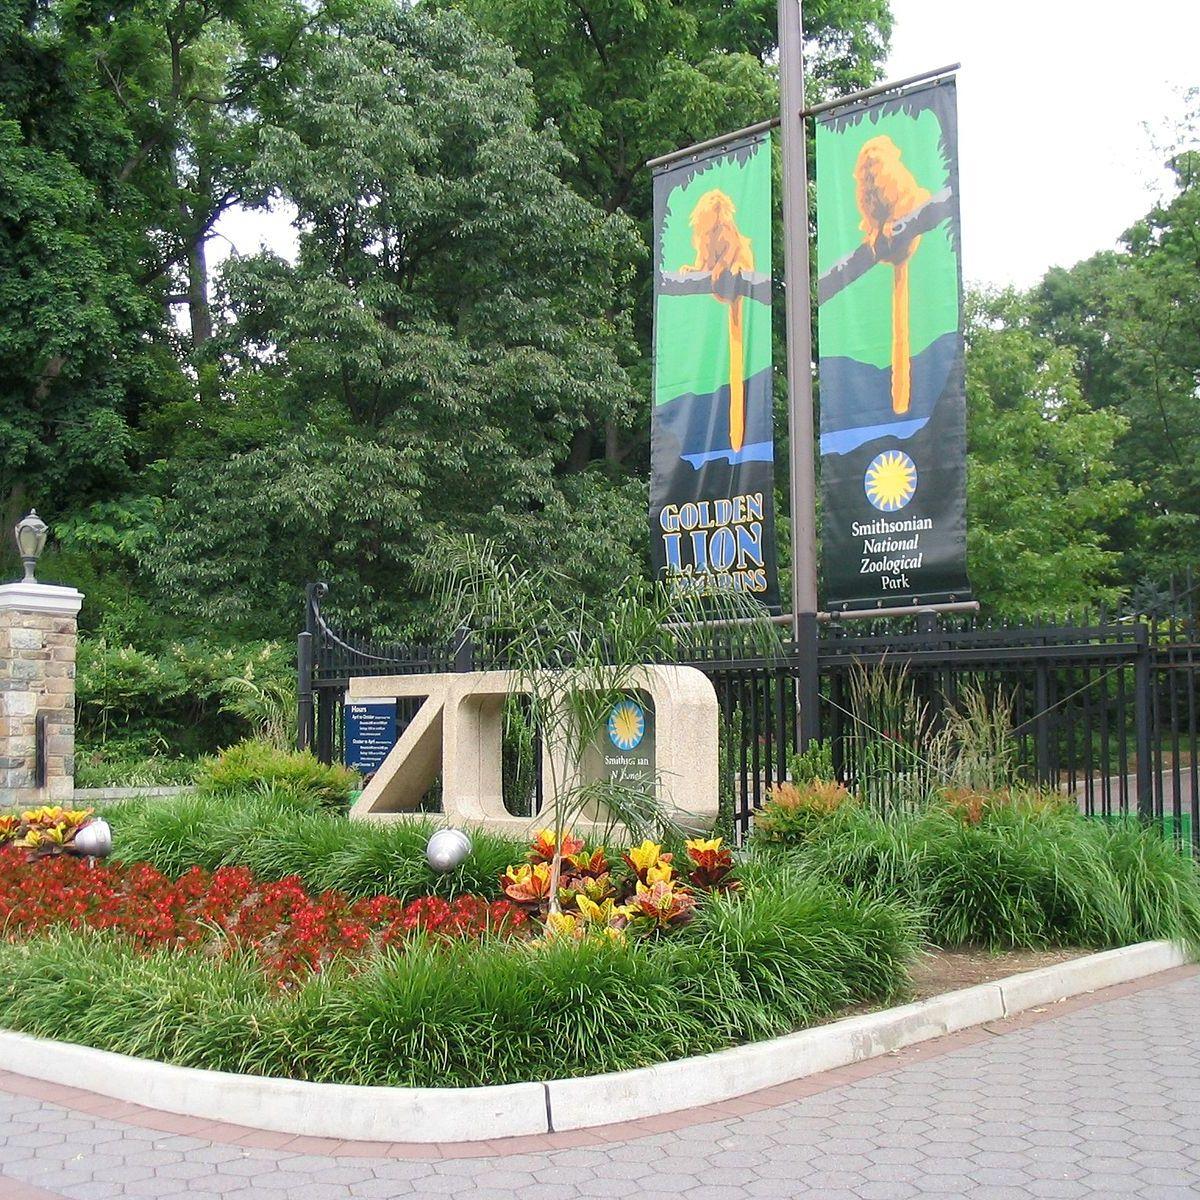 National Zoo, Washington, D.C.